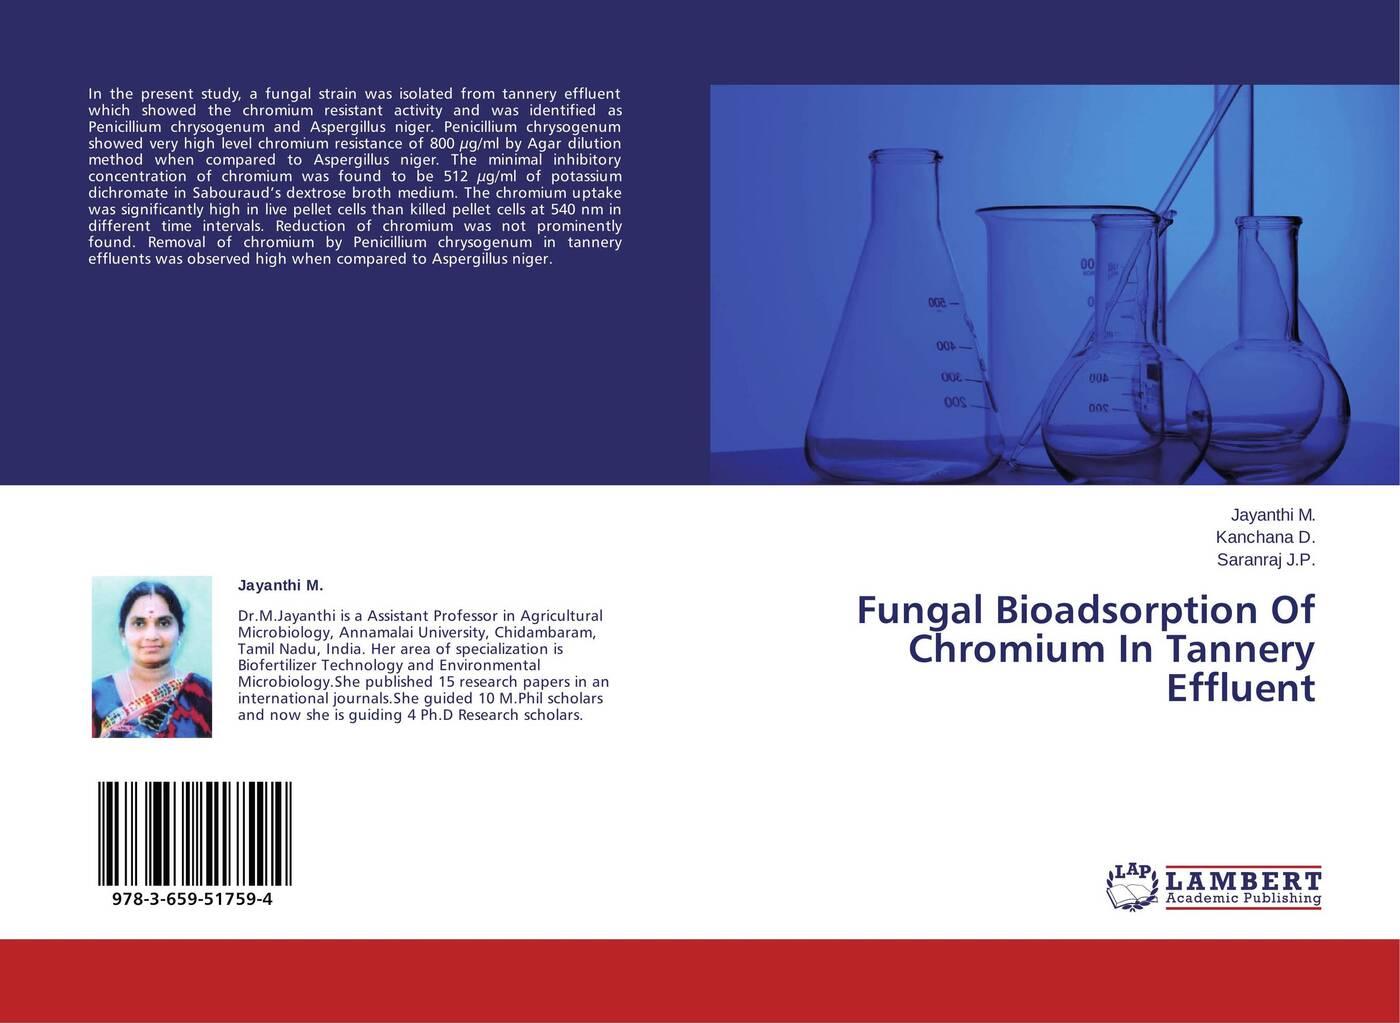 Jayanthi M.,Kanchana D. and Saranraj J.P. Fungal Bioadsorption Of Chromium In Tannery Effluent john vincent the bioinorganic chemistry of chromium